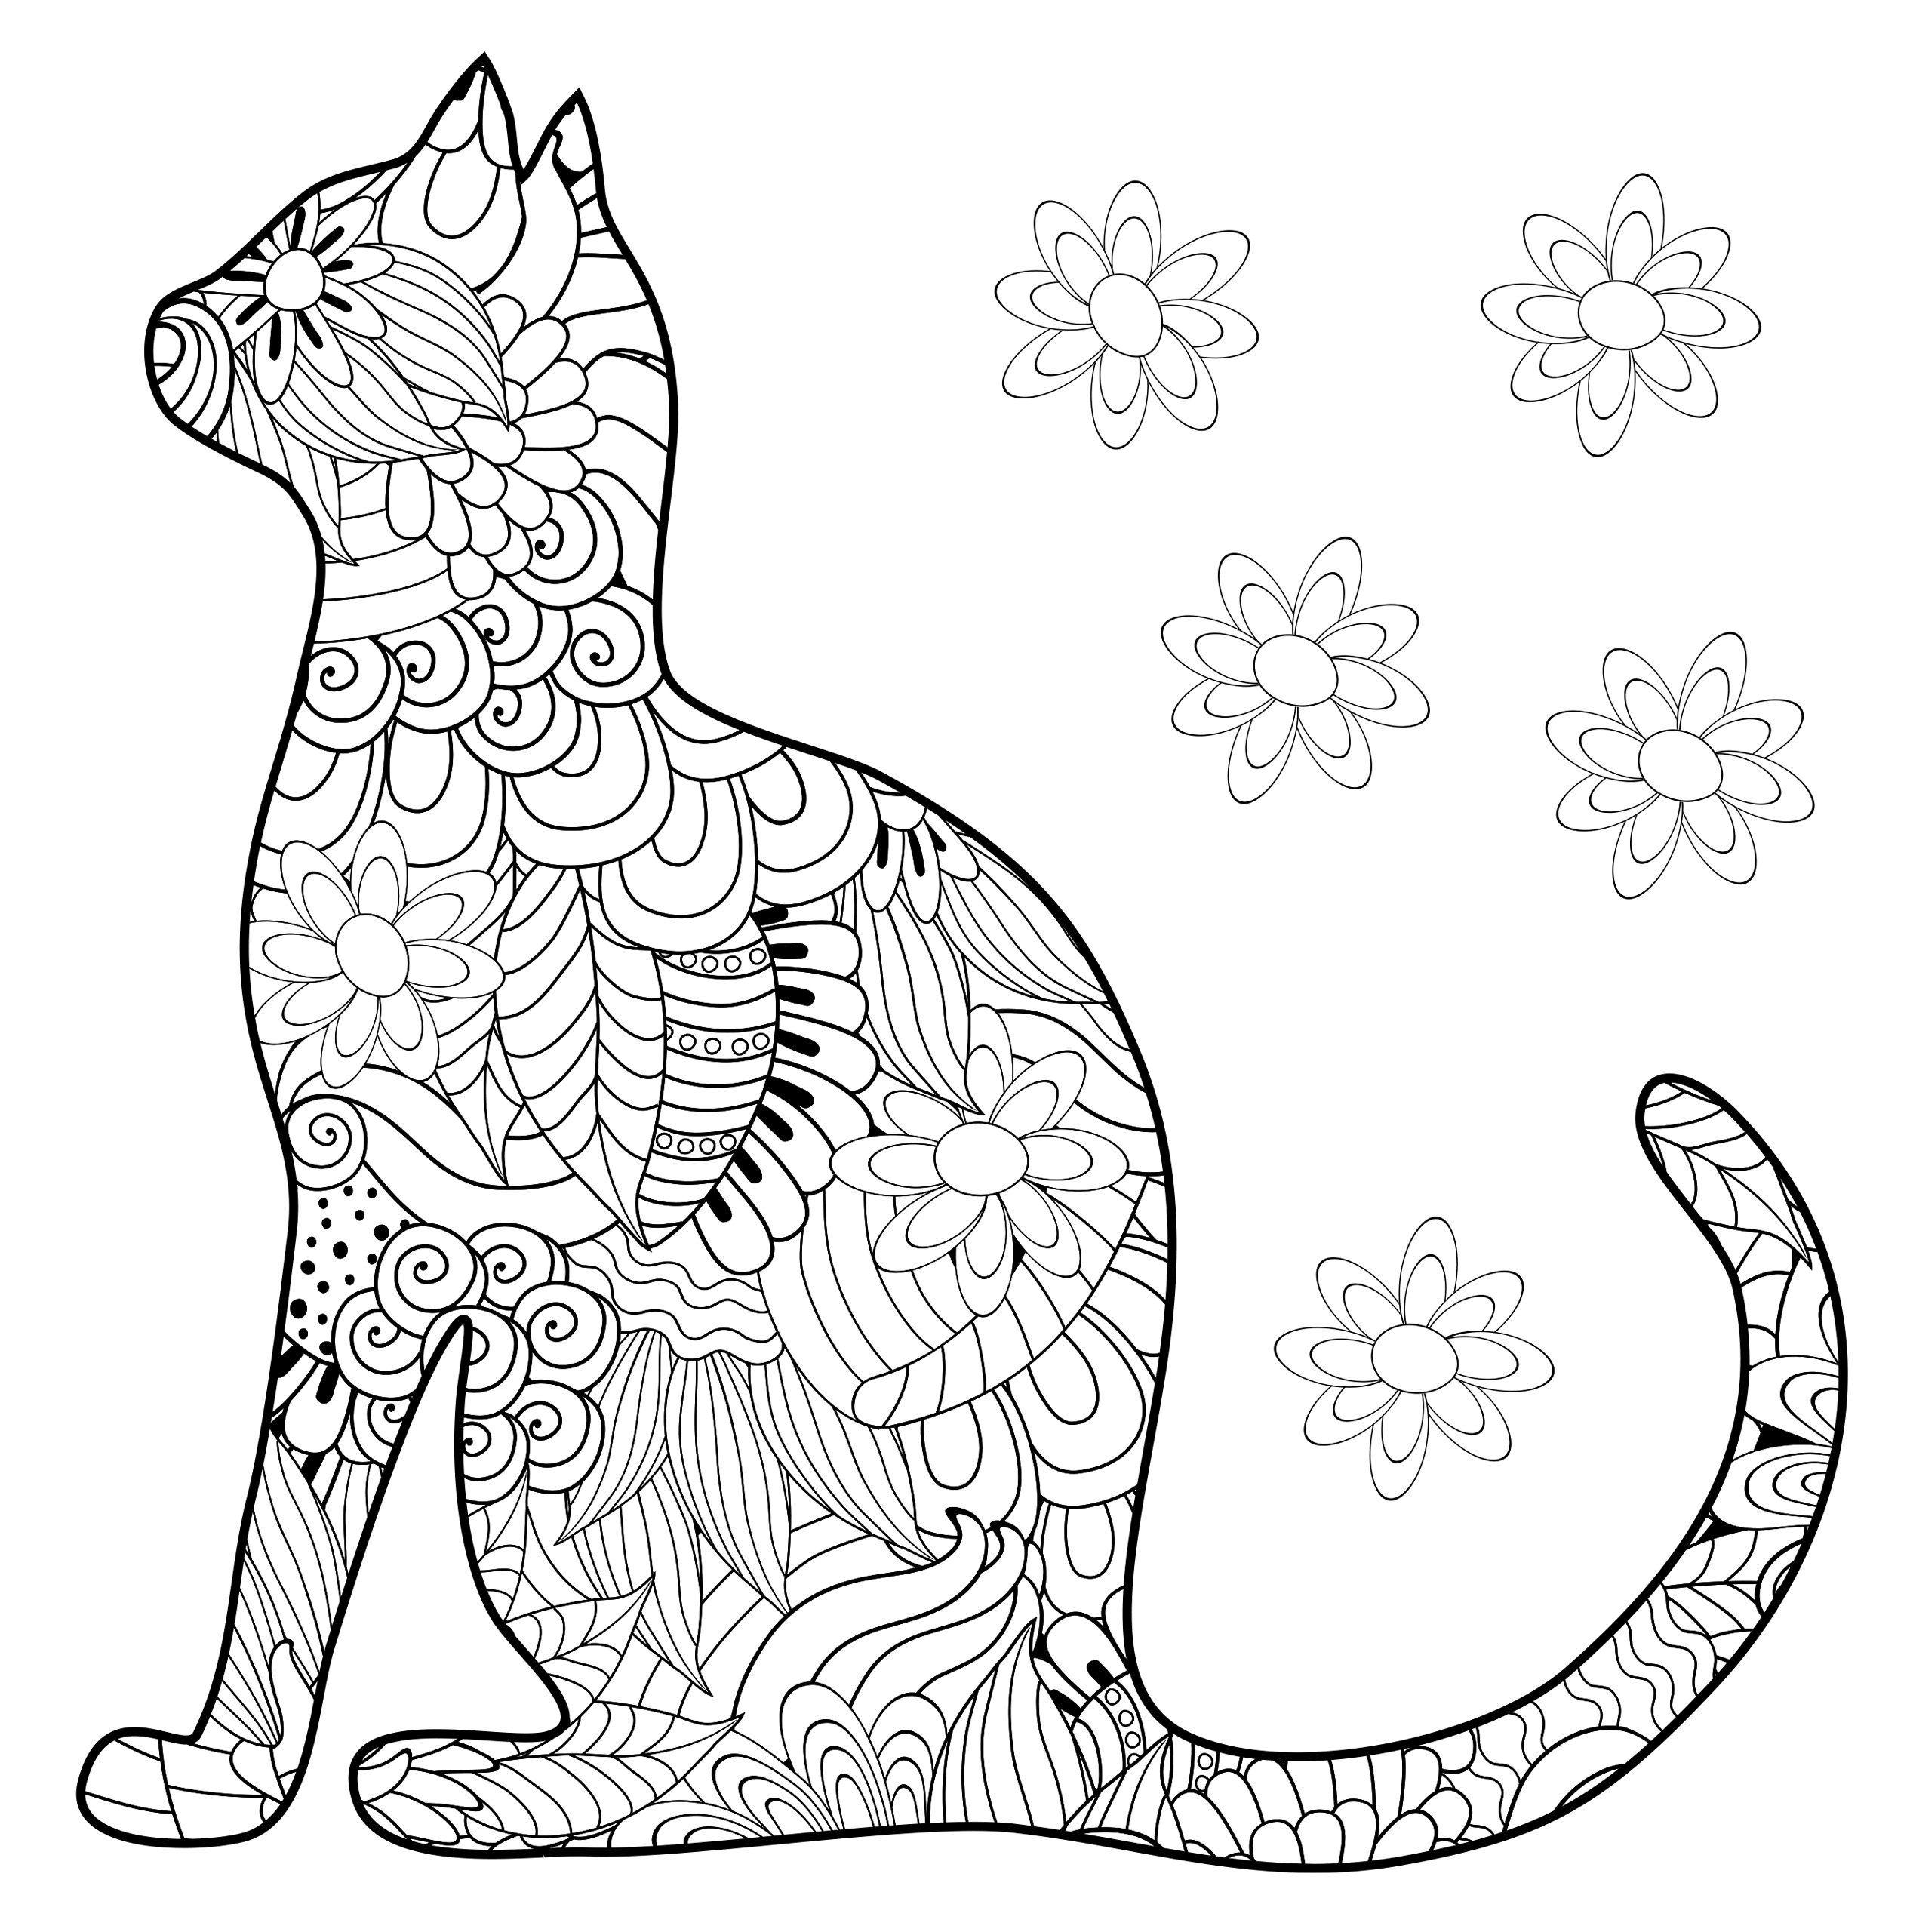 Силуэт кошки - Животные | Раскраски мандала, Раскраски, Силуэт